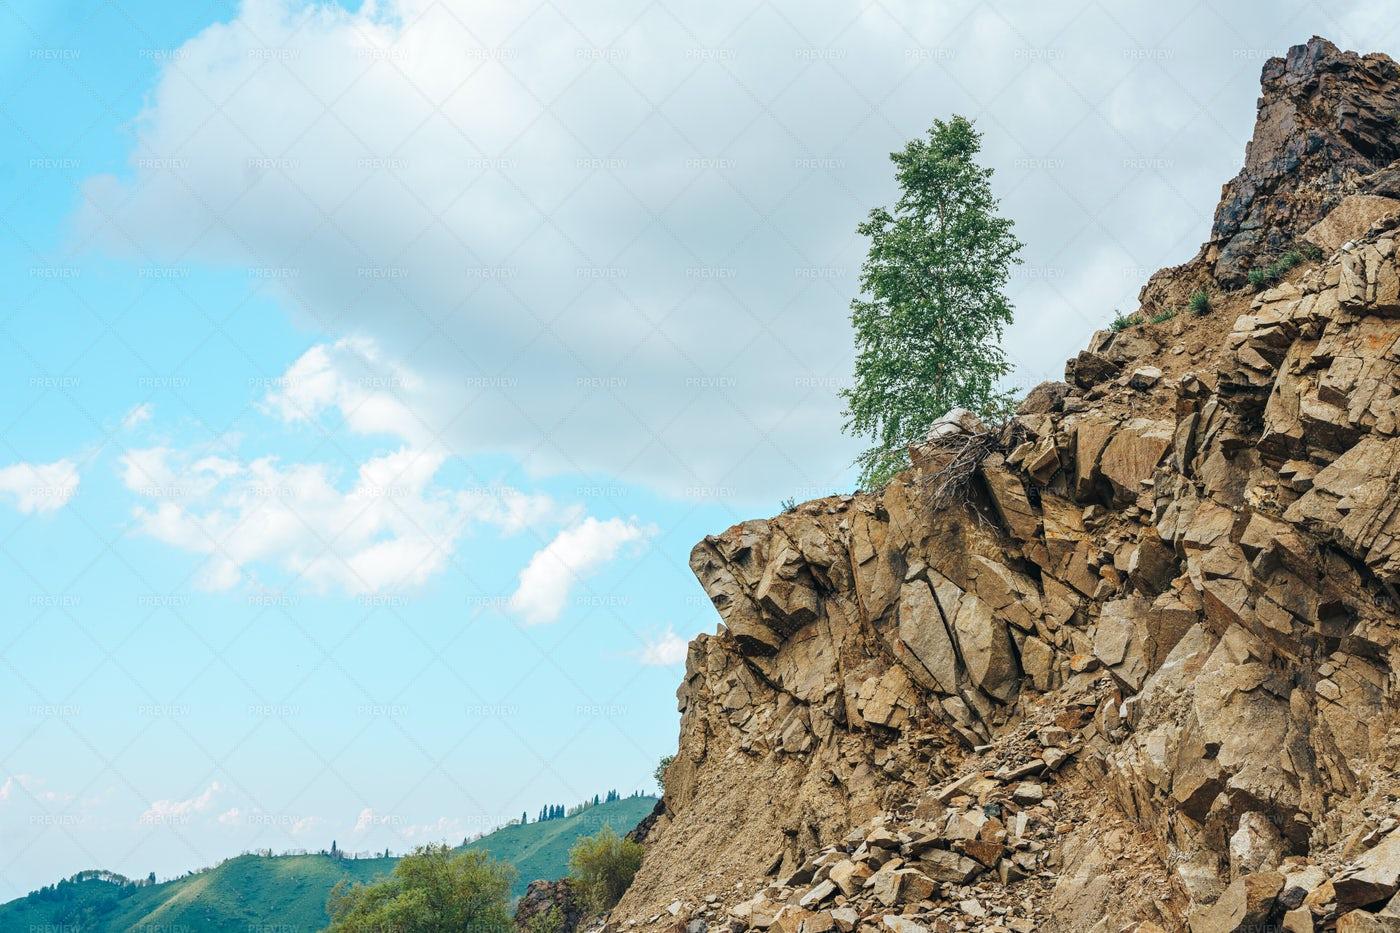 Tree On A Rock: Stock Photos